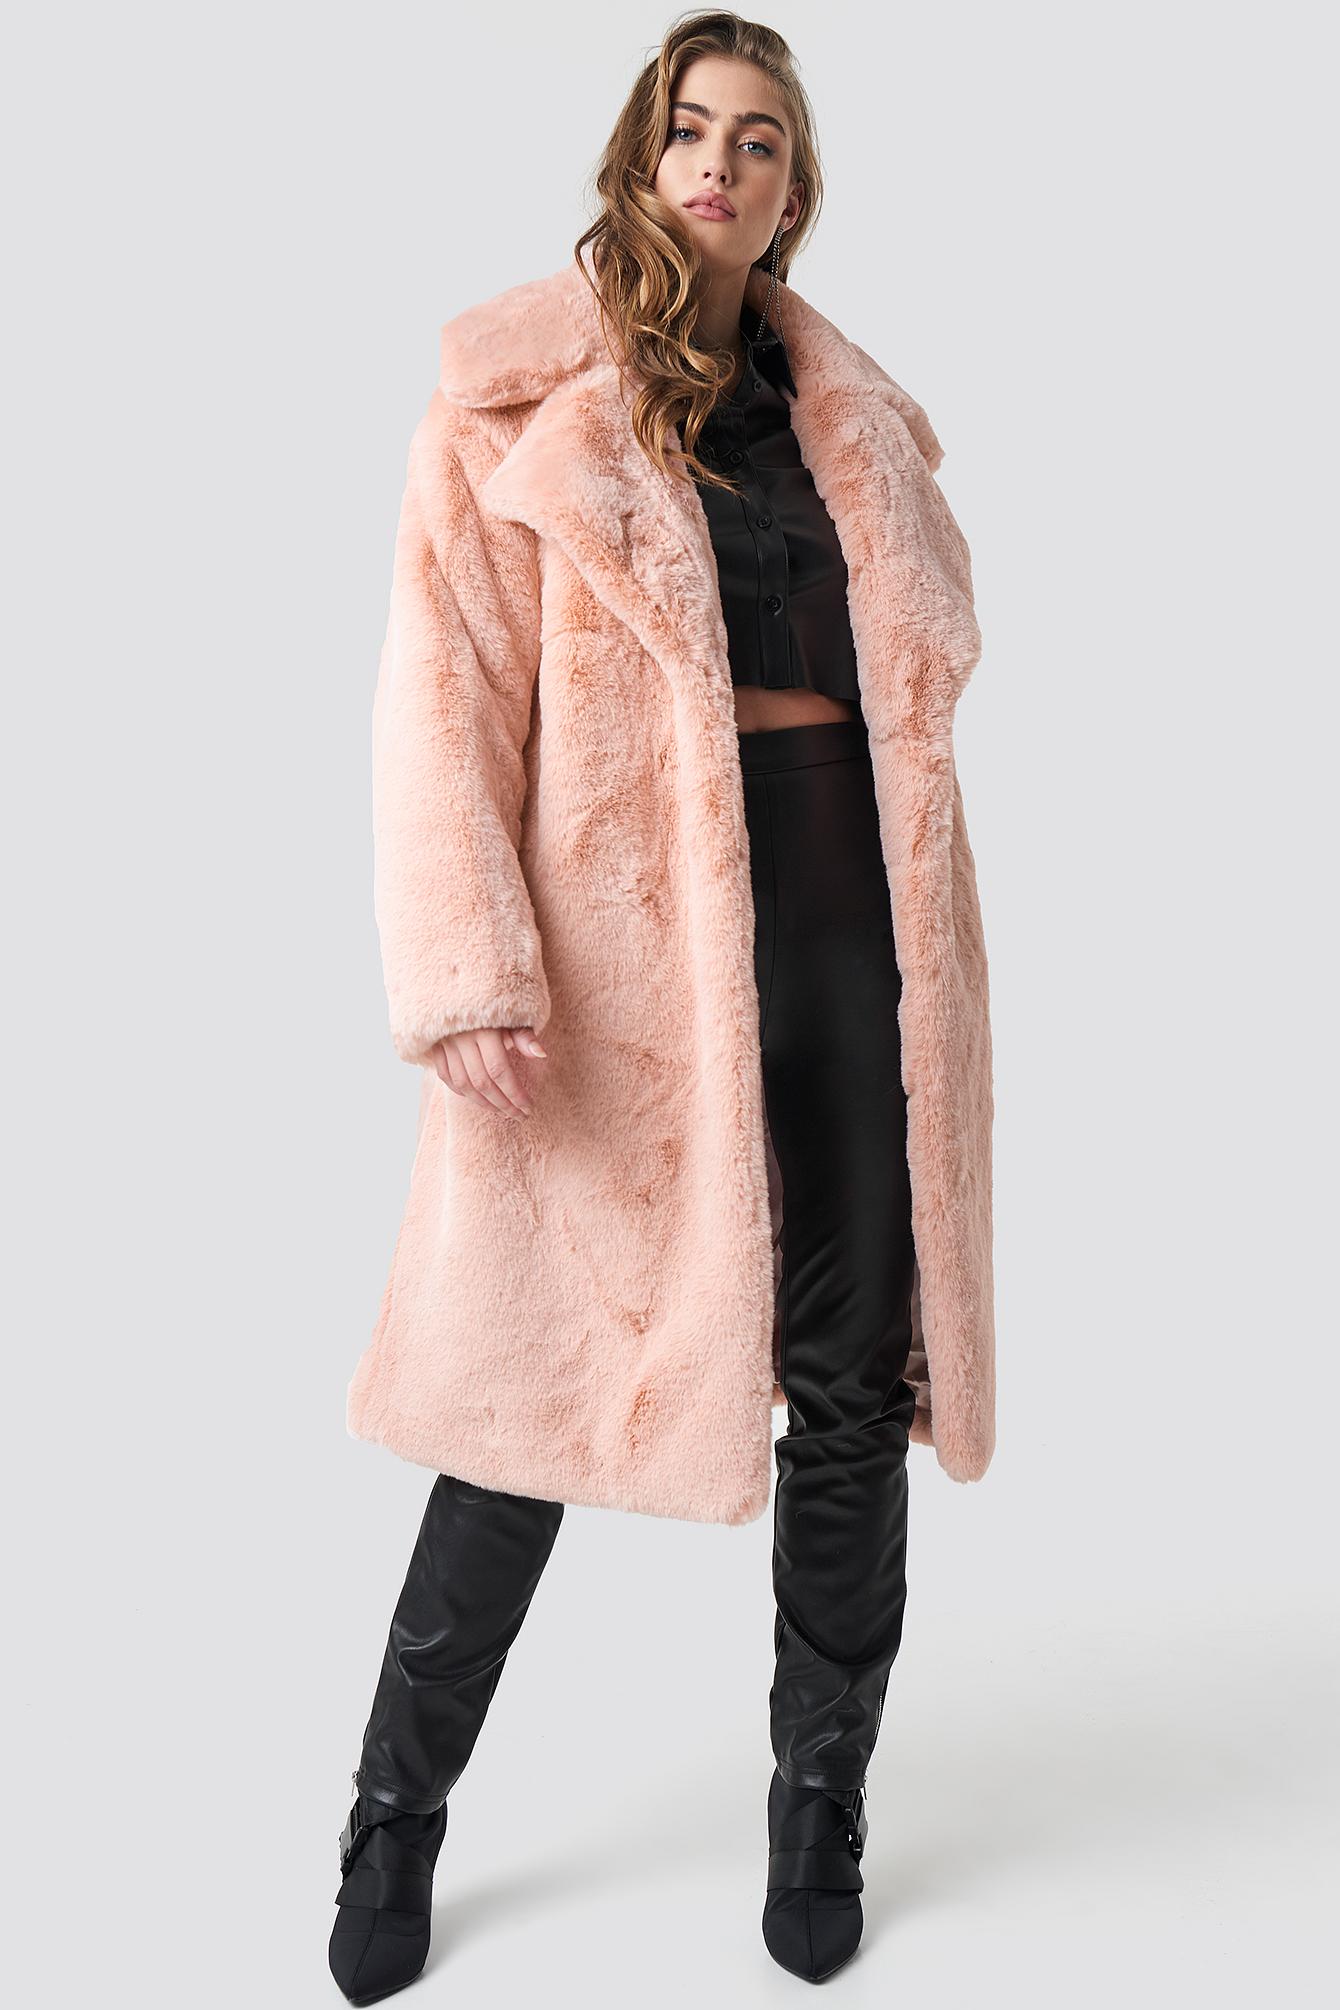 hannalicious x na-kd -  Belted Faux Fur Midi Coat - Pink